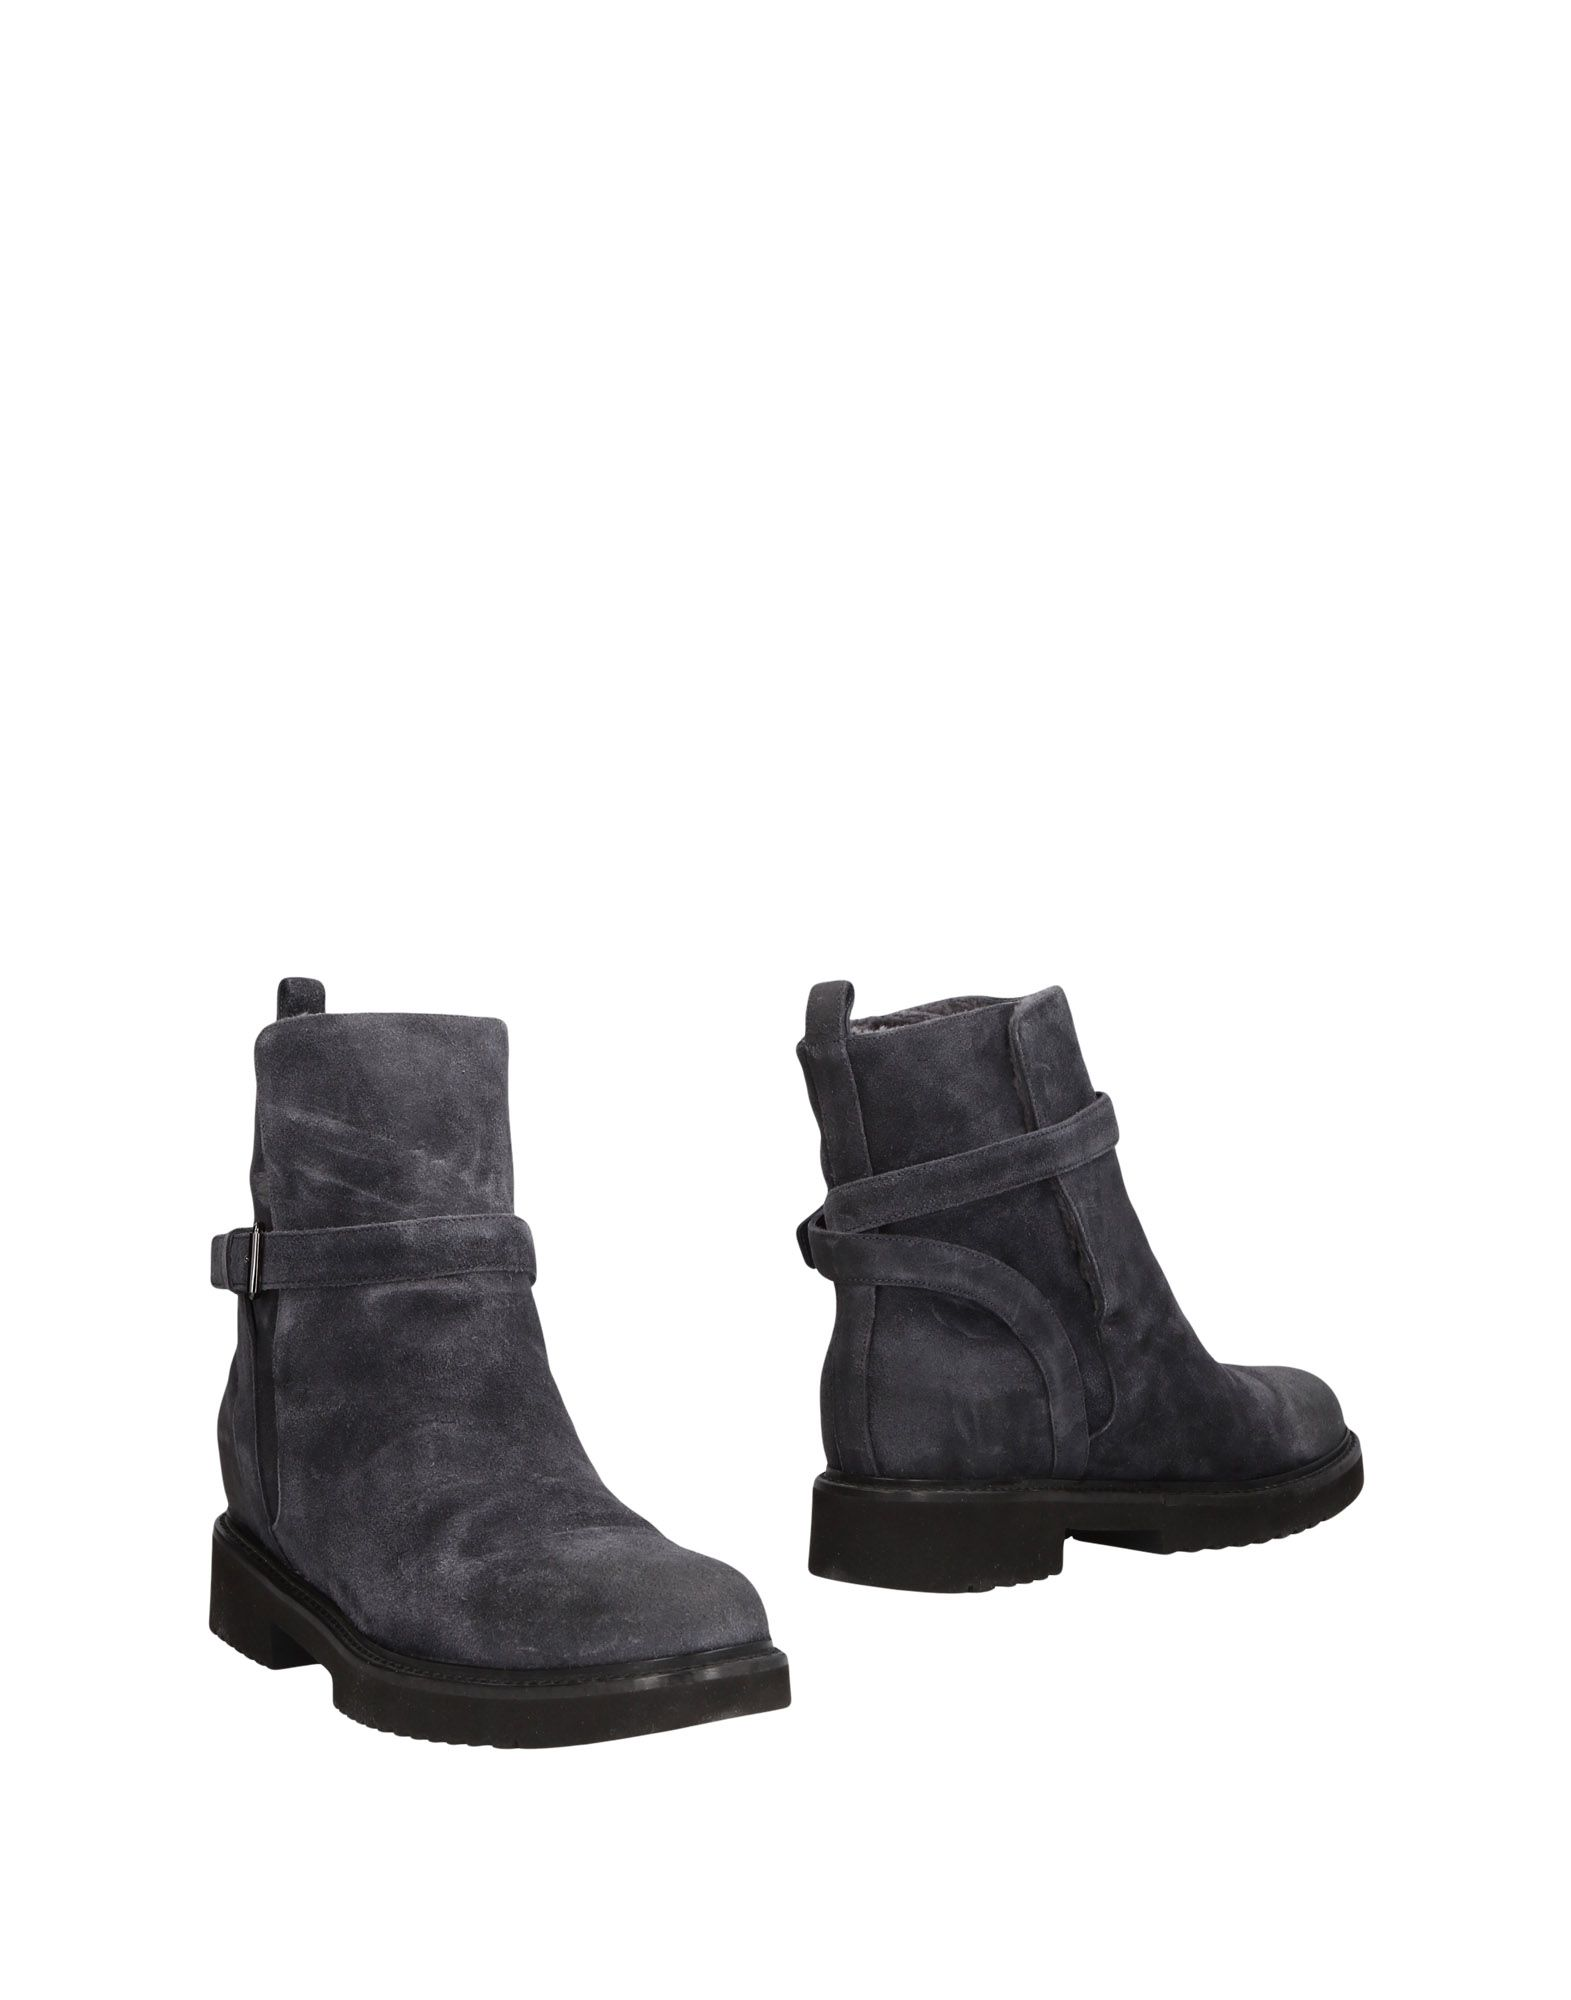 Vince. Vince. Ankle Boot - Women Vince. Vince. Ankle Boots online on  Australia - 11415714BP a35197